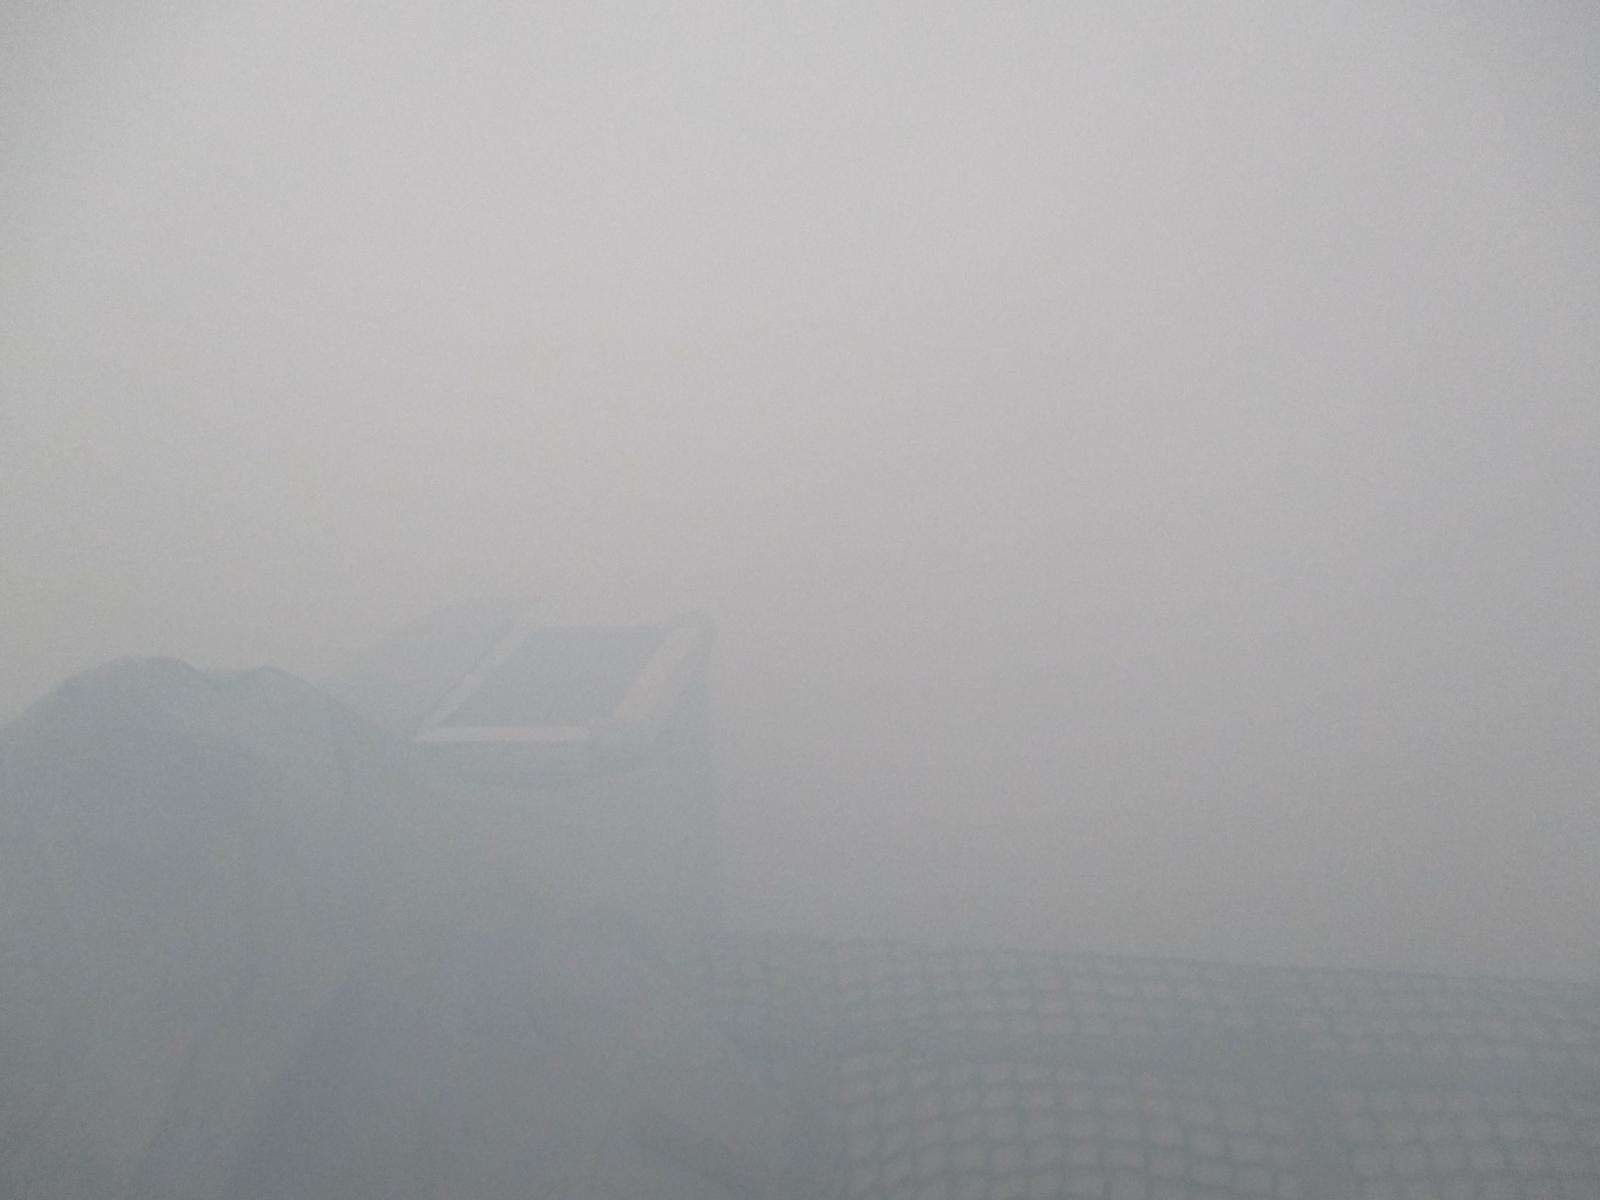 Nebel - ahoi!